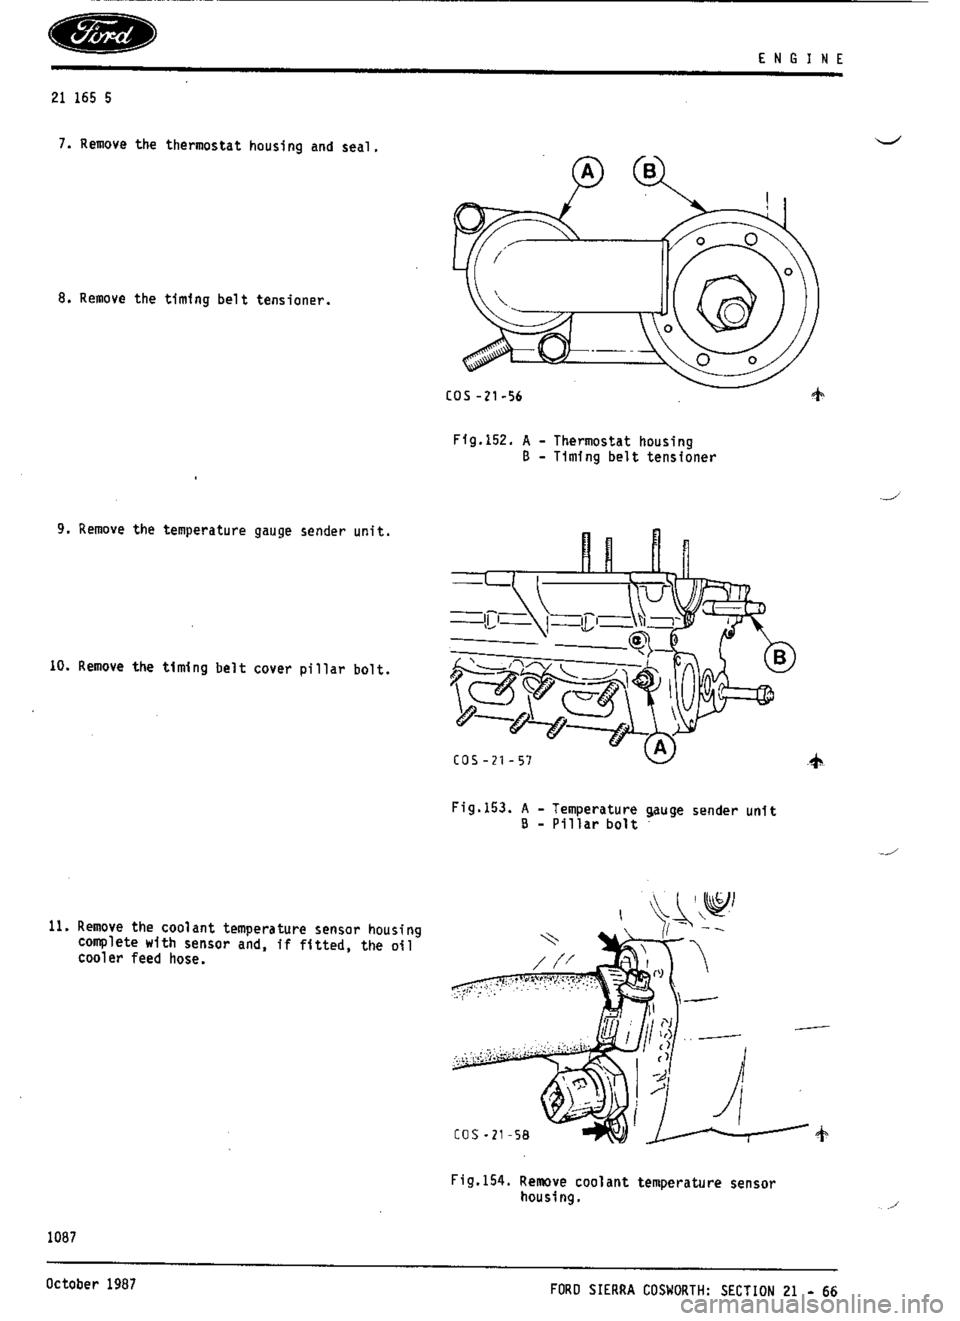 hight resolution of 2000 oldsmobile bravada engine diagram html 2002 oldsmobile bravada fuse diagram 2002 oldsmobile bravada body parts